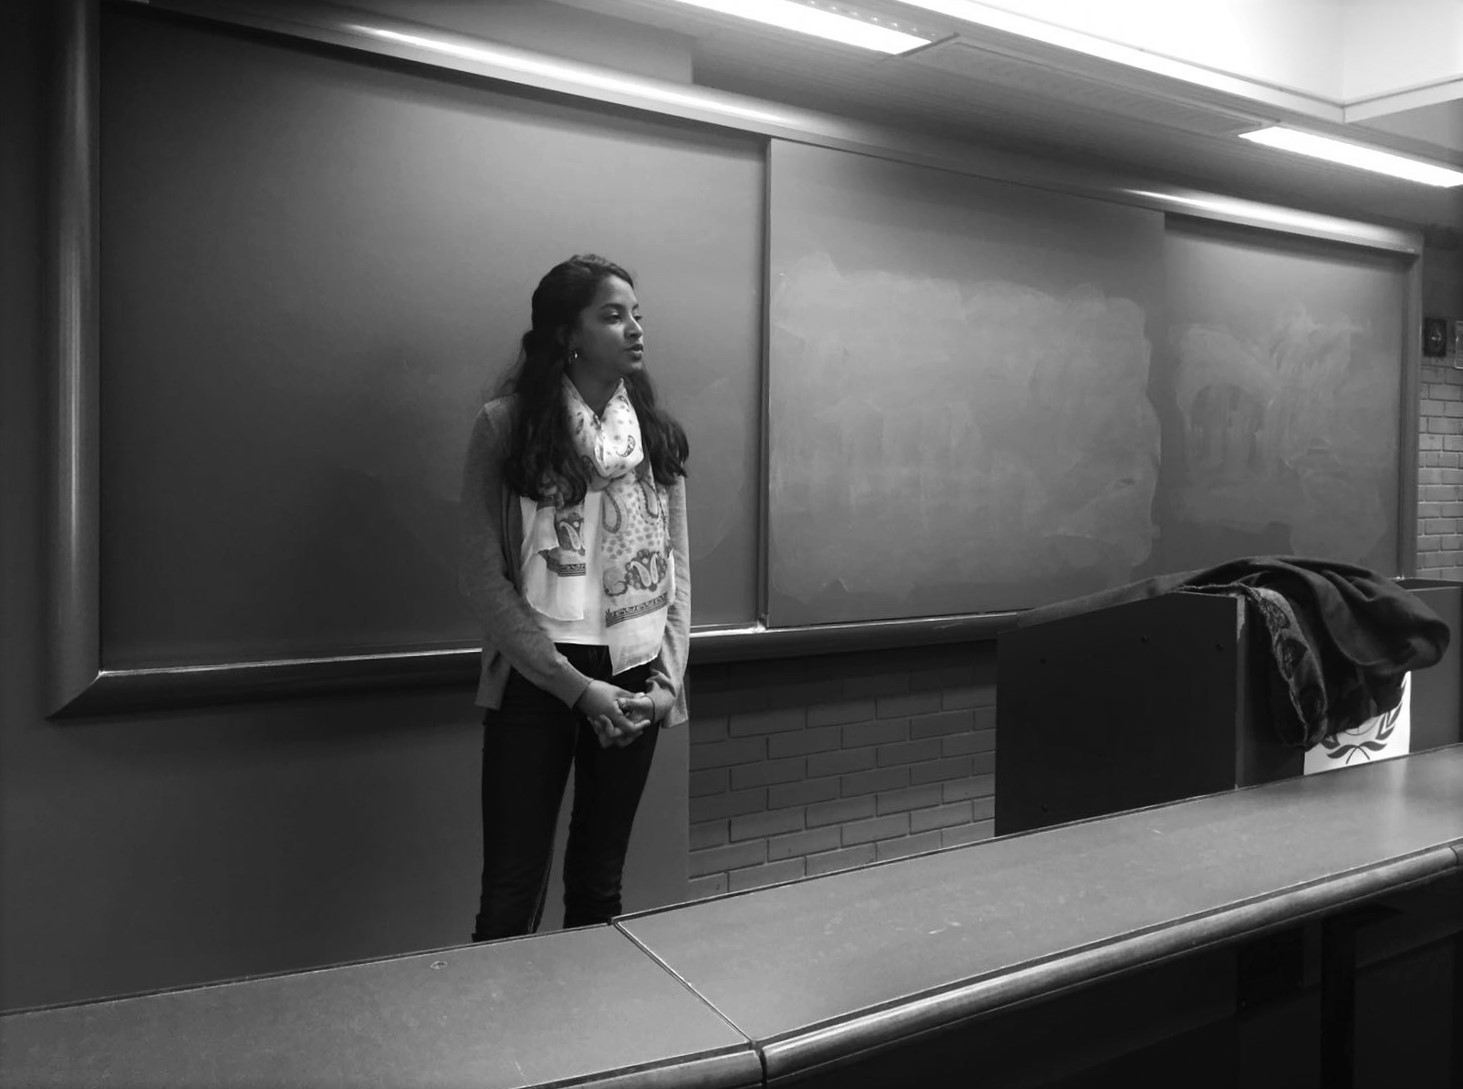 Oral presentation on art